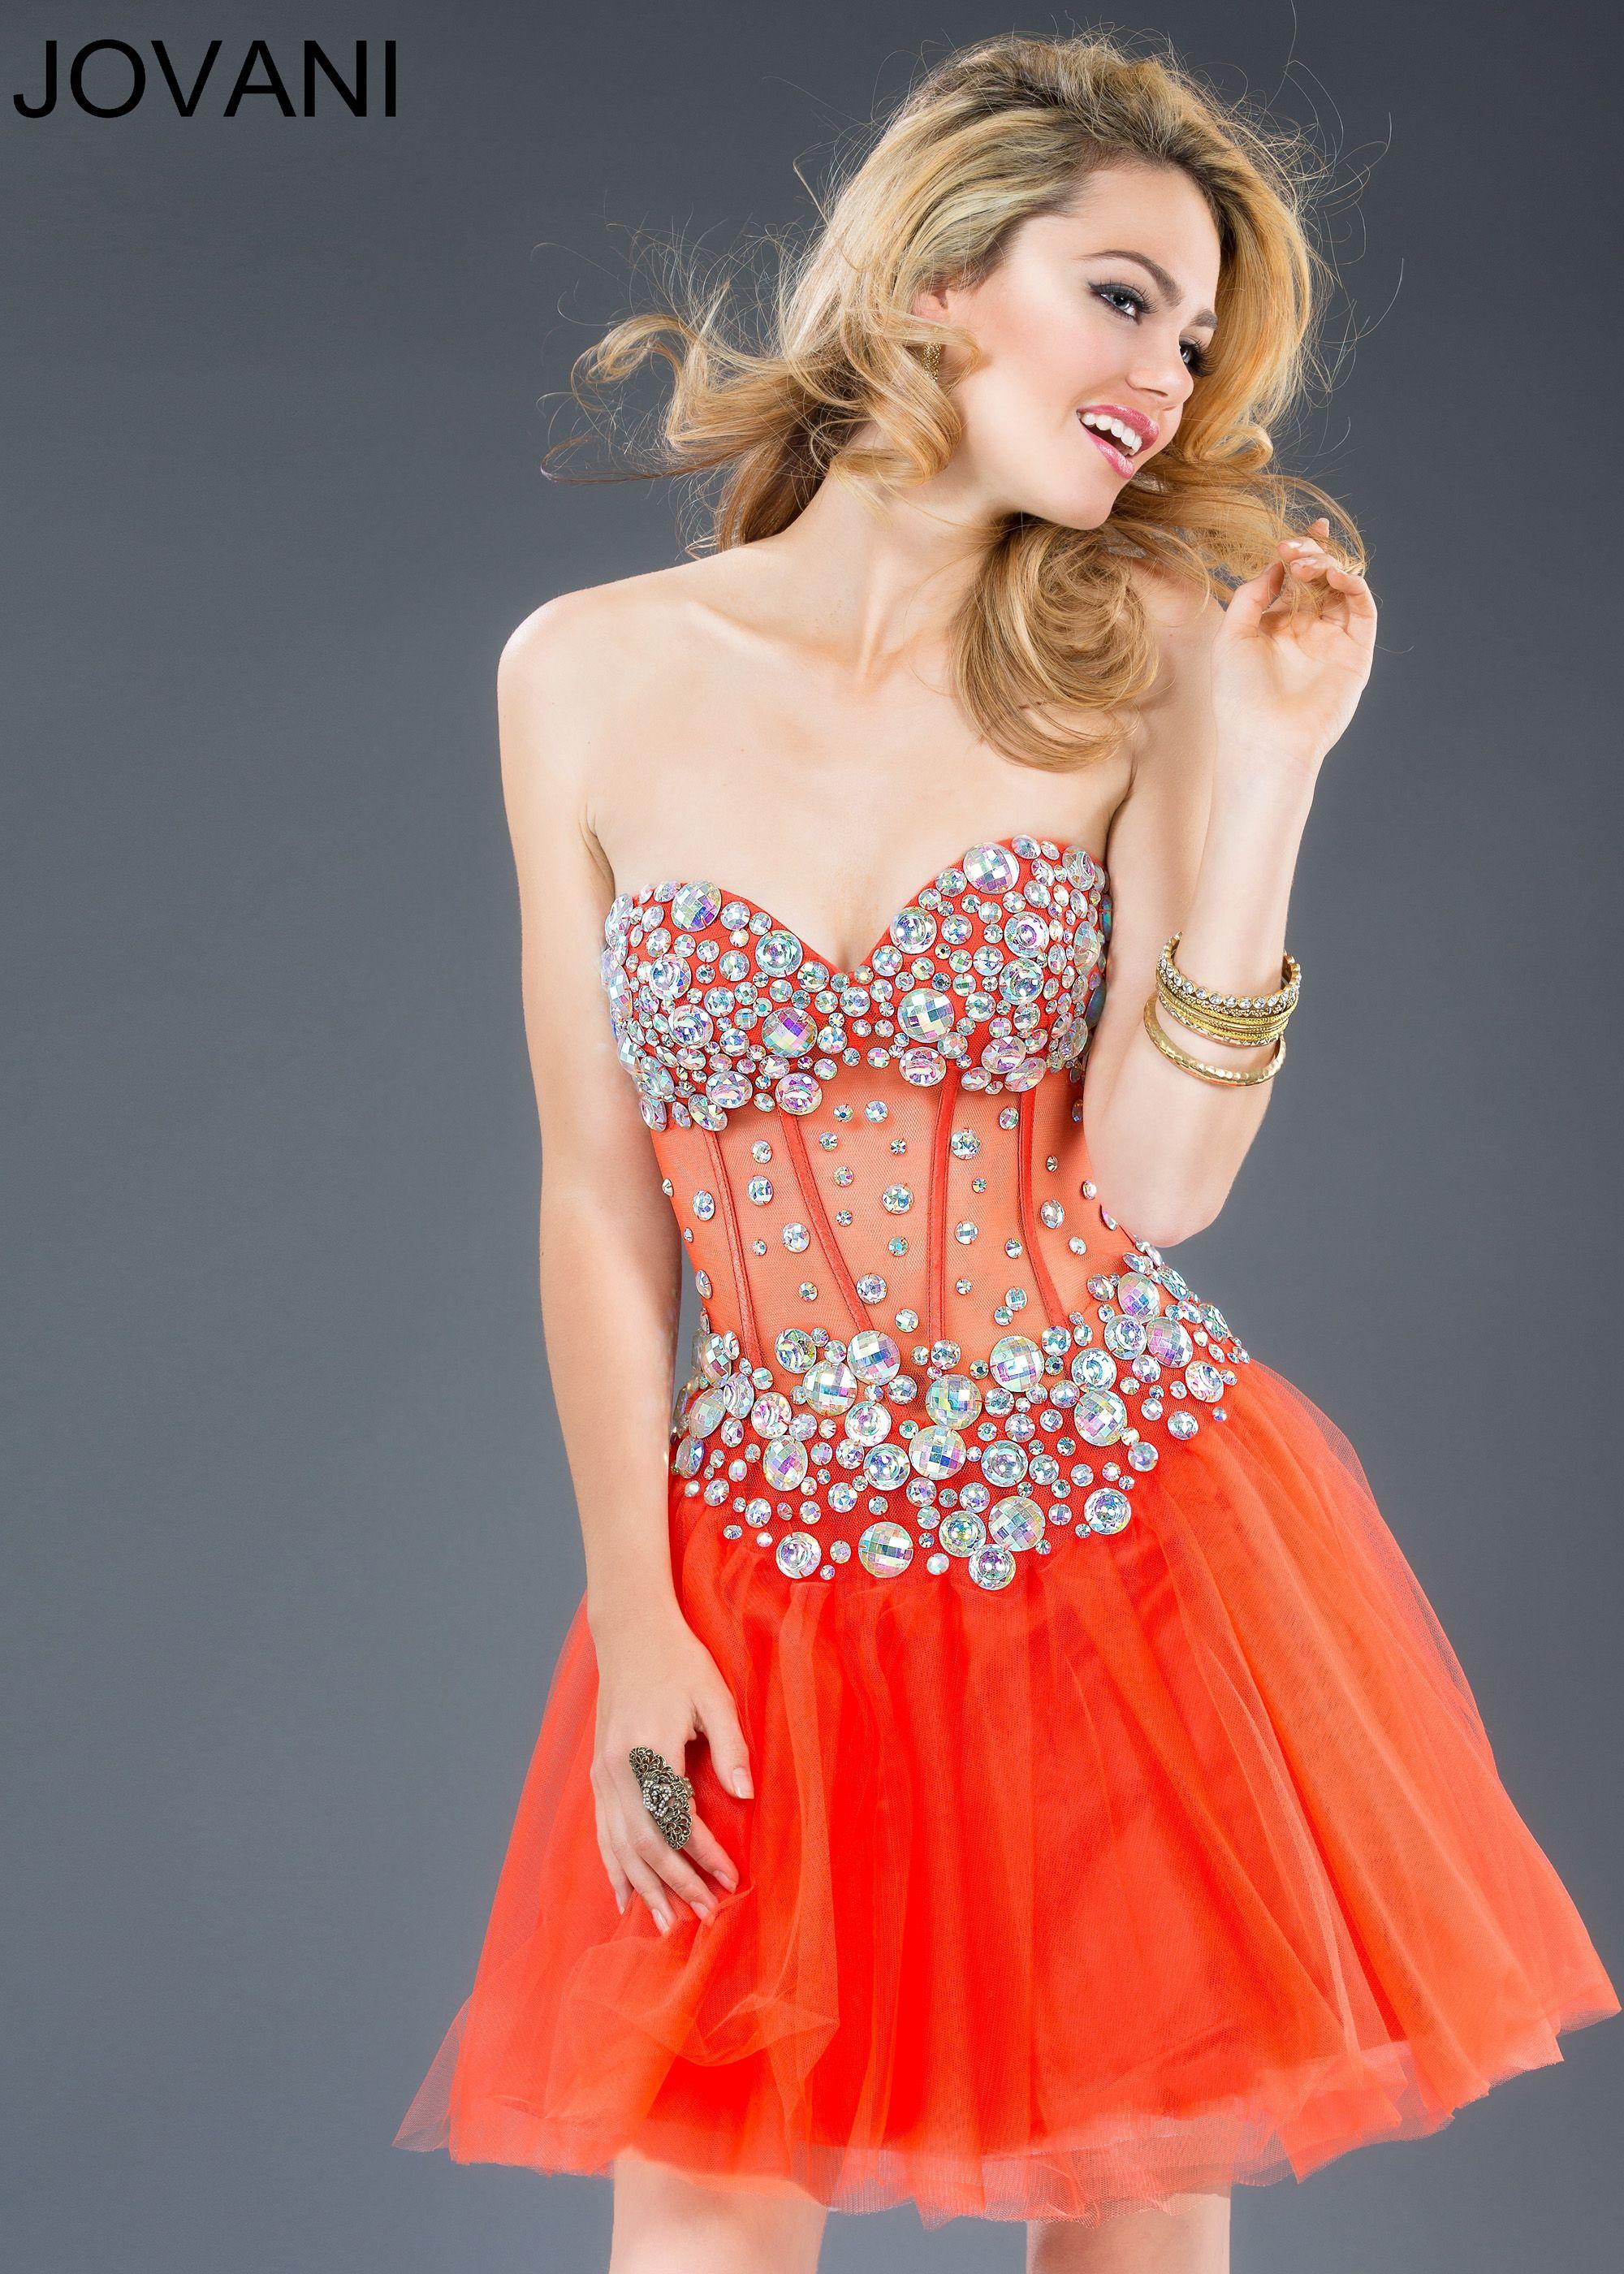 Perfect For Fall! We Love Orange!Jovani 88750 - Short Orange Strapless Corset Homecoming Dresses Online